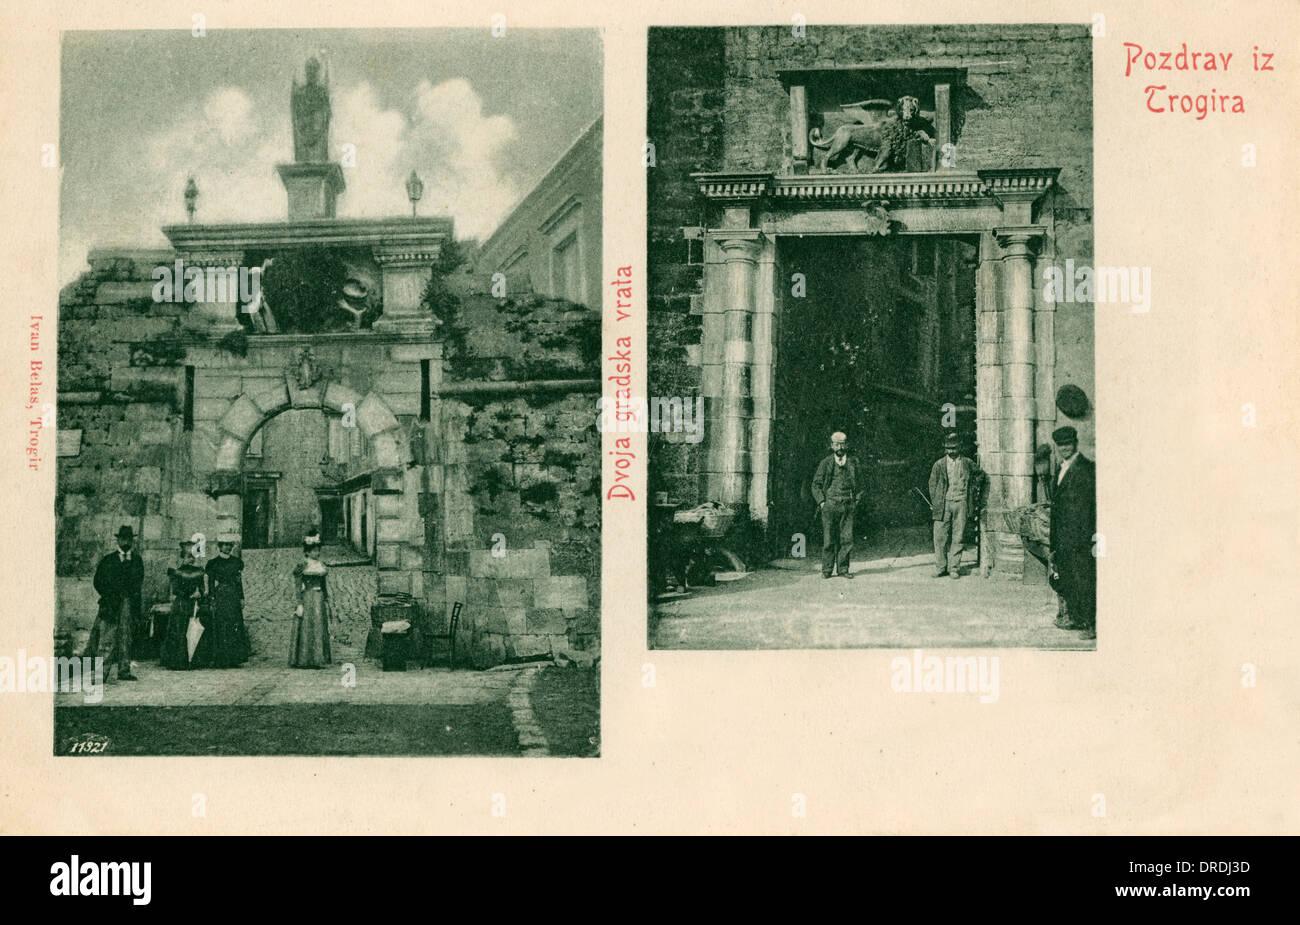 Trogir - Venetian Gateways - Stock Image